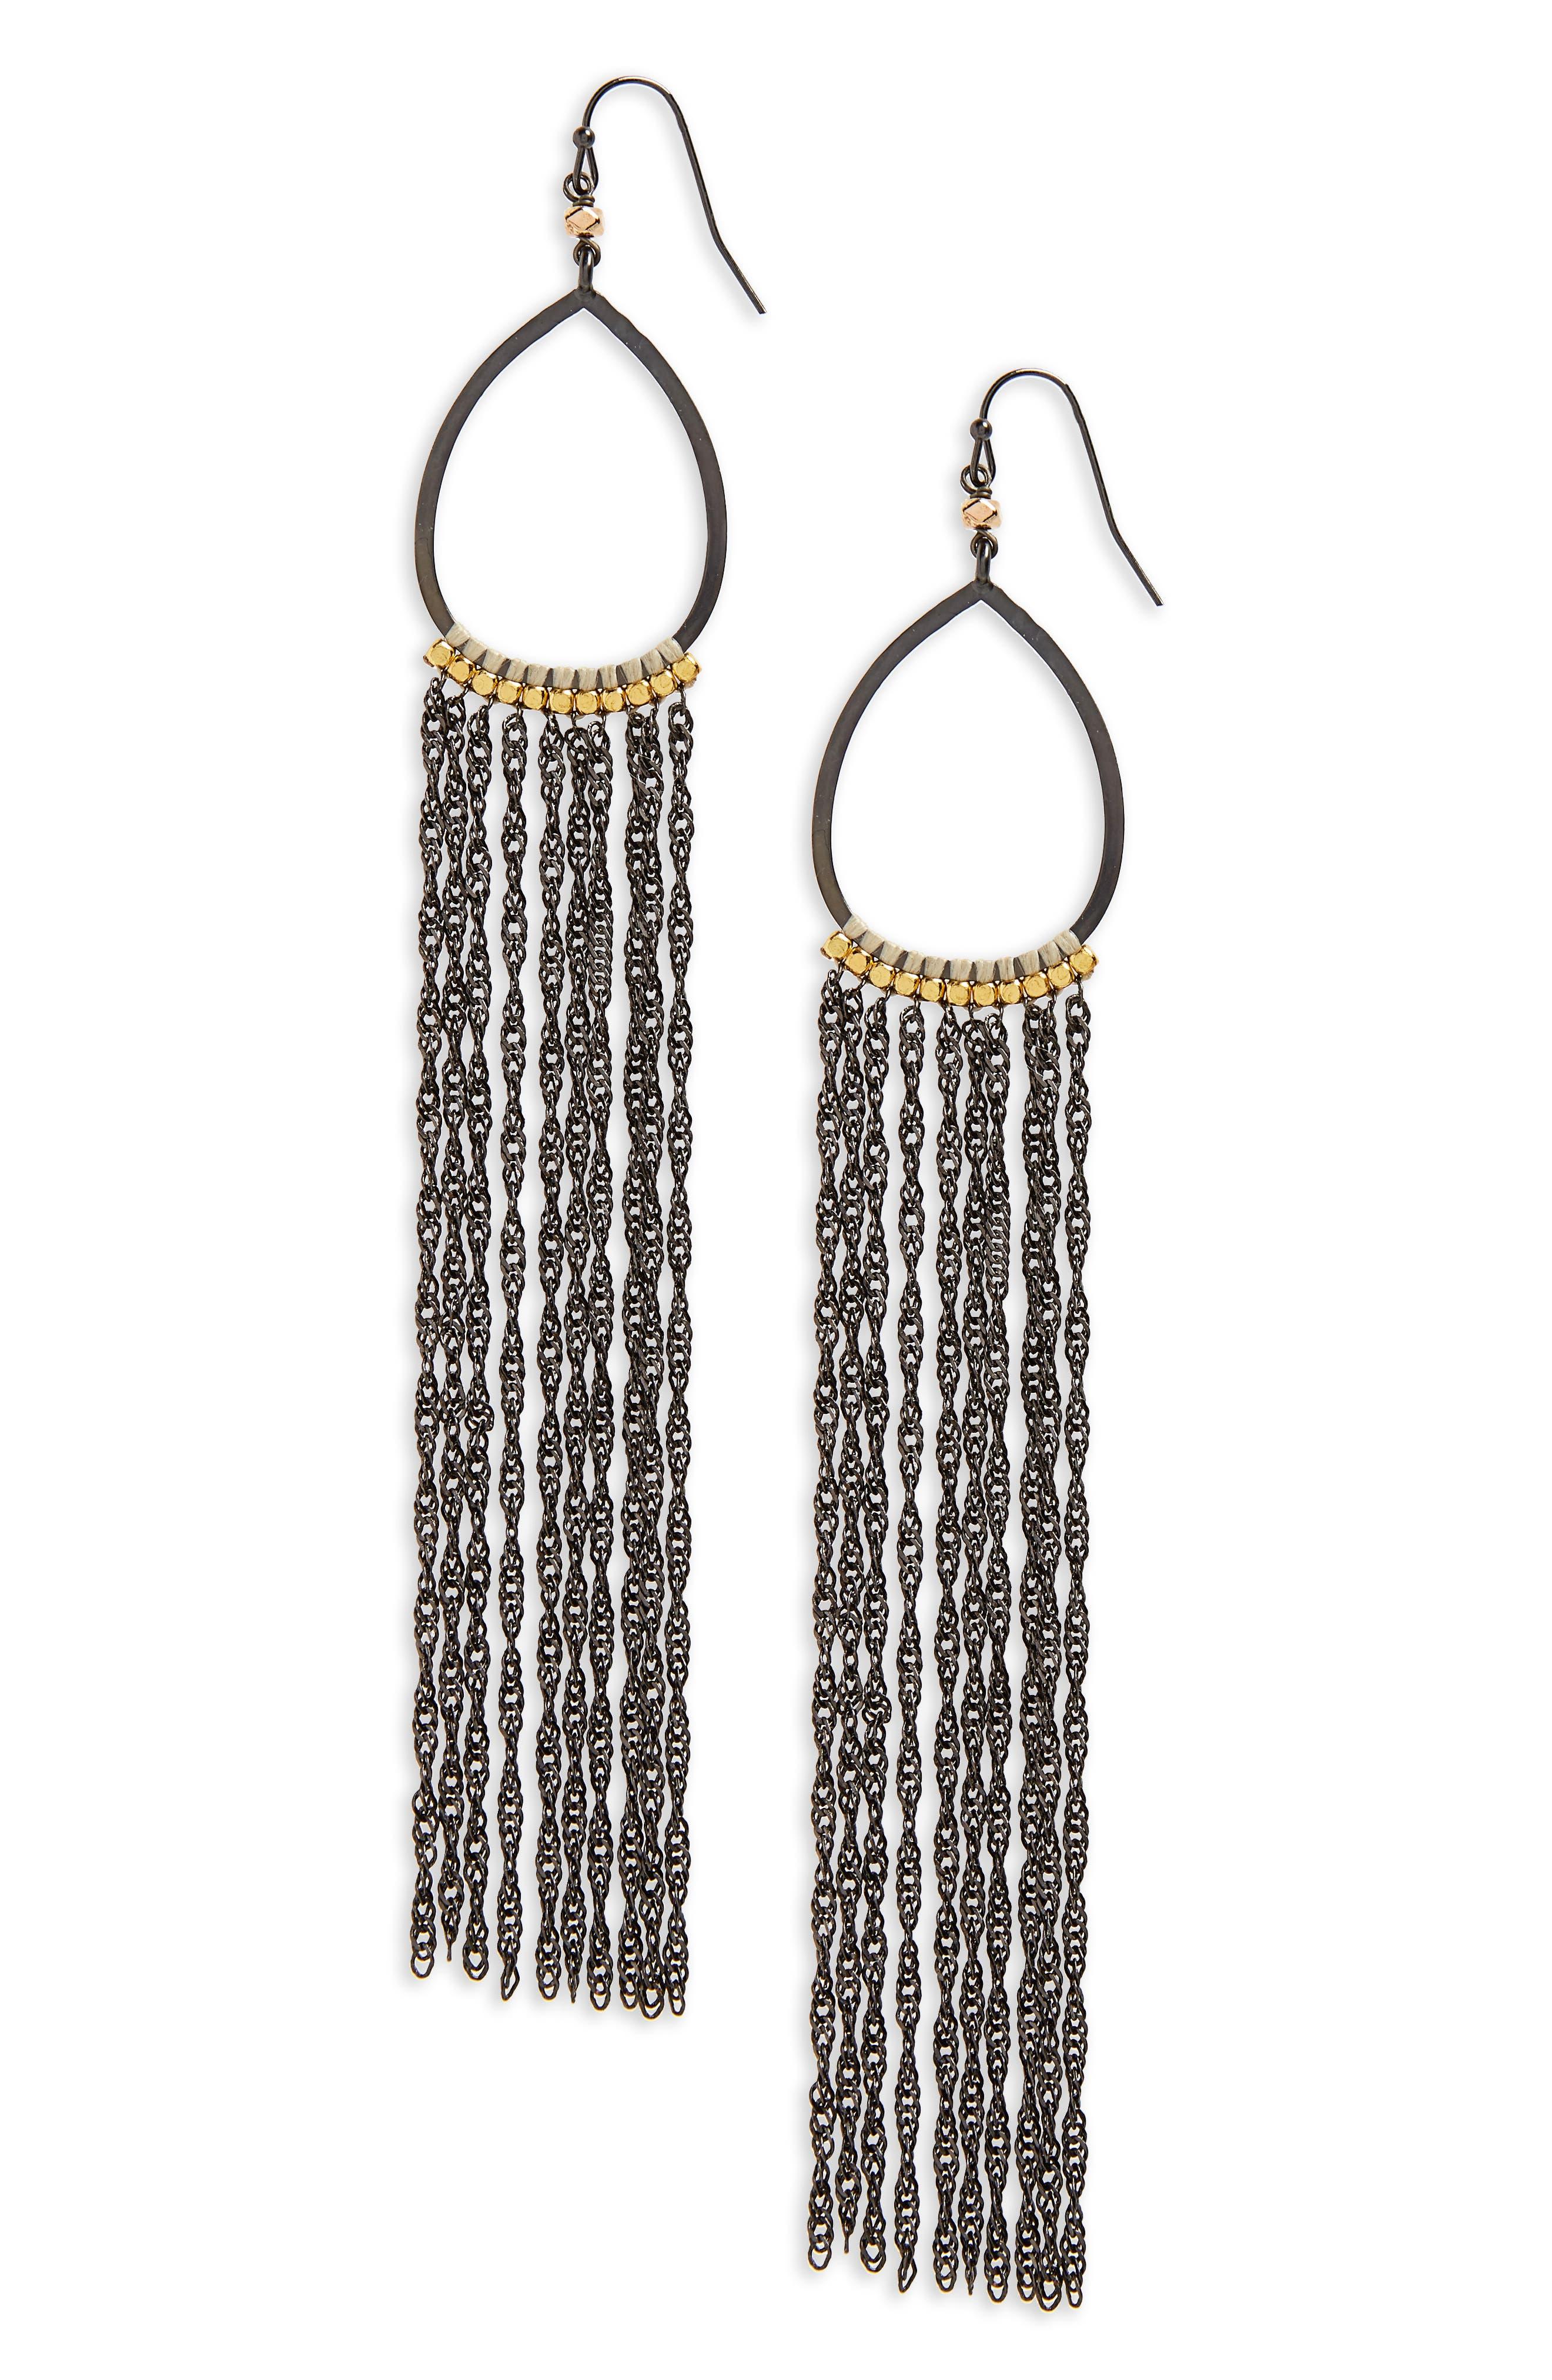 Extra Long Chain Fringe Earrings,                             Main thumbnail 1, color,                             020